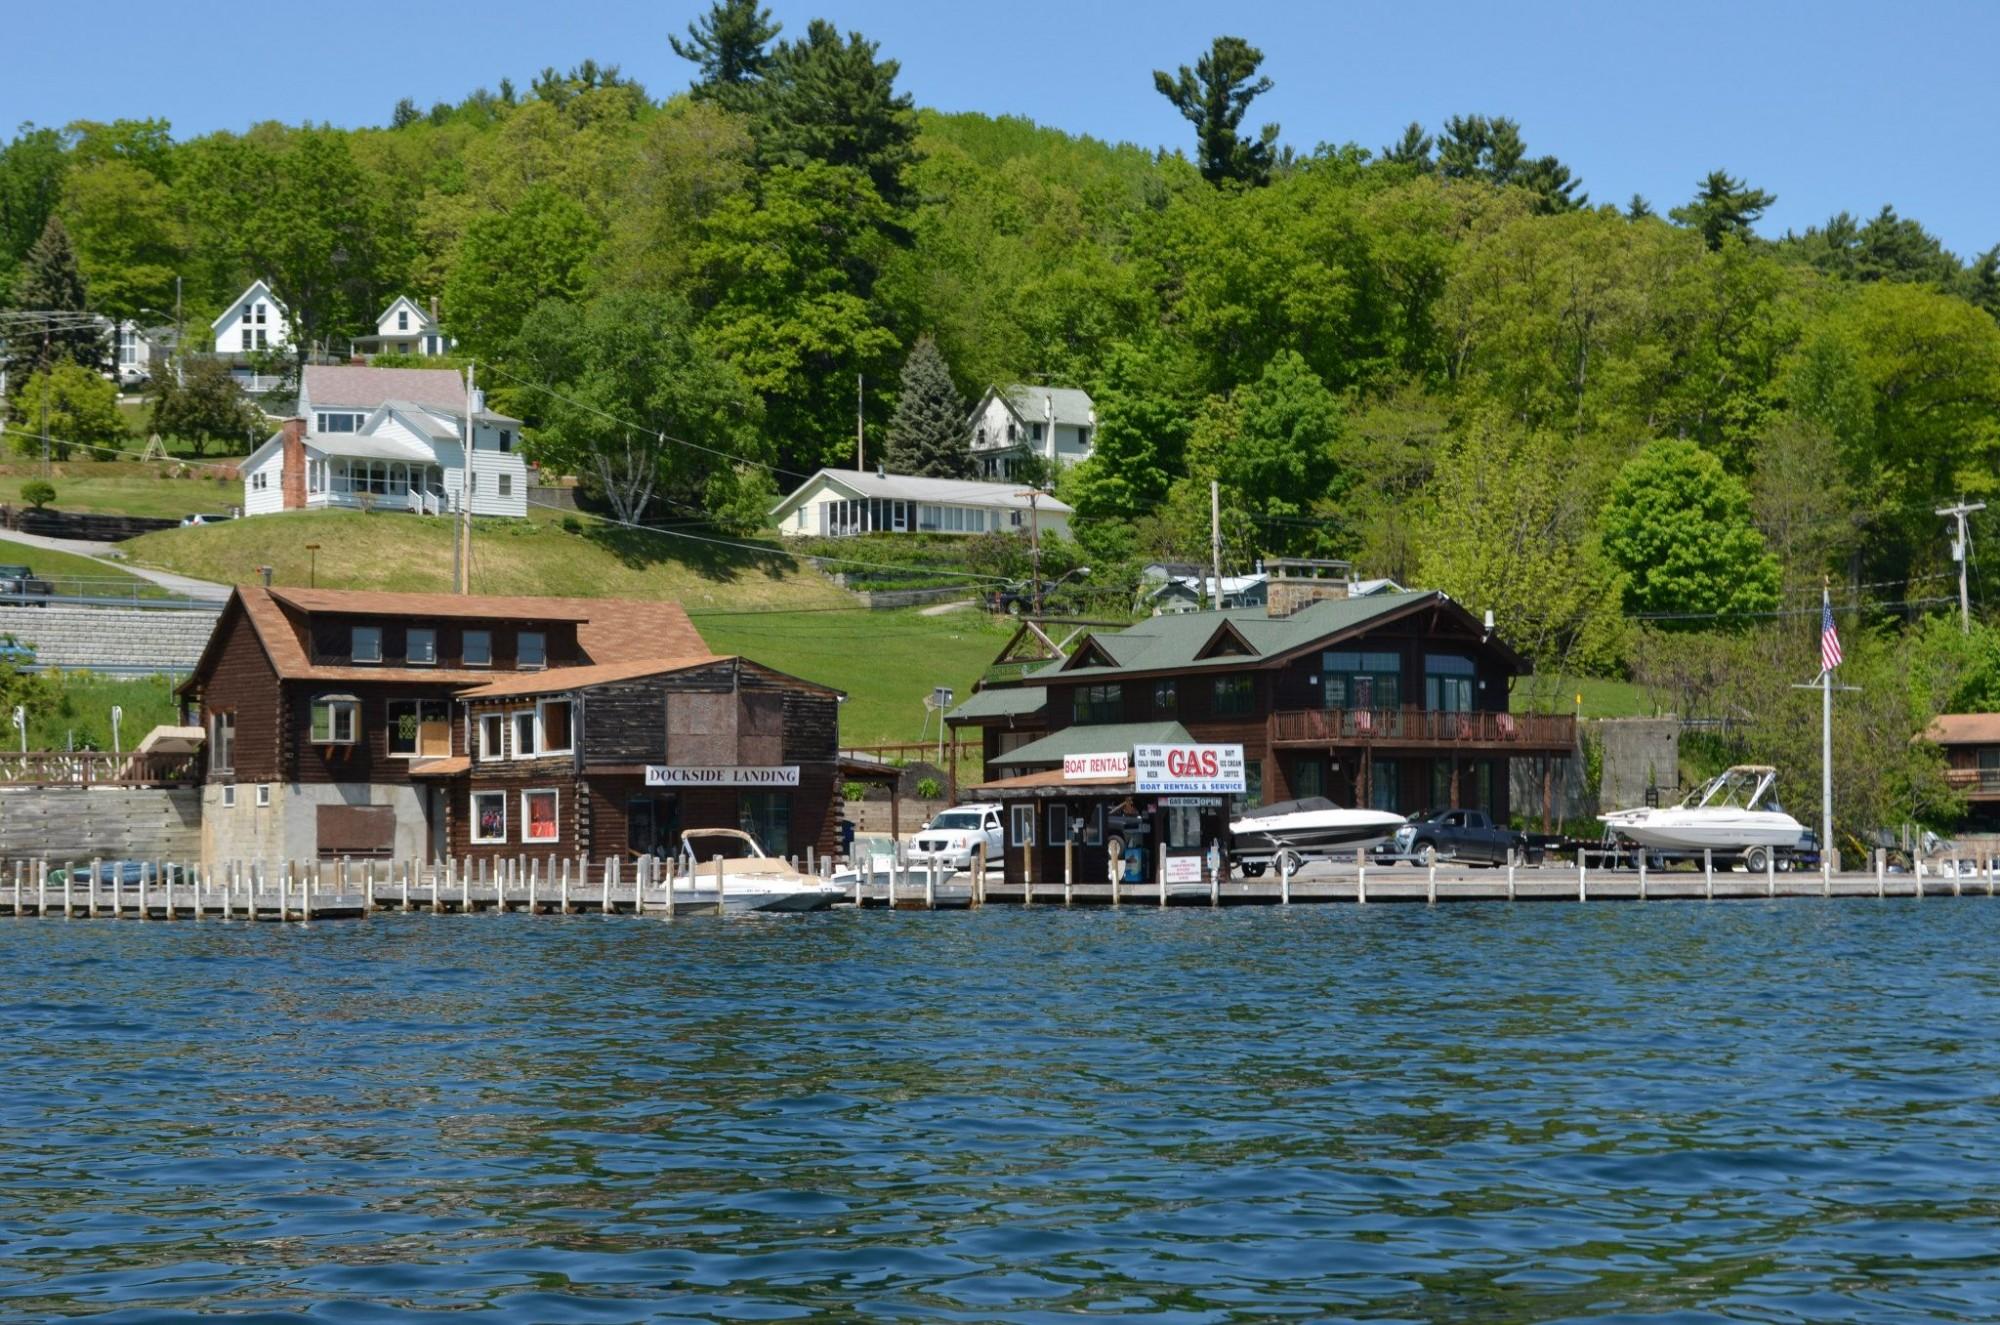 Dockside landing boat & yacht sales lake george ny 2014